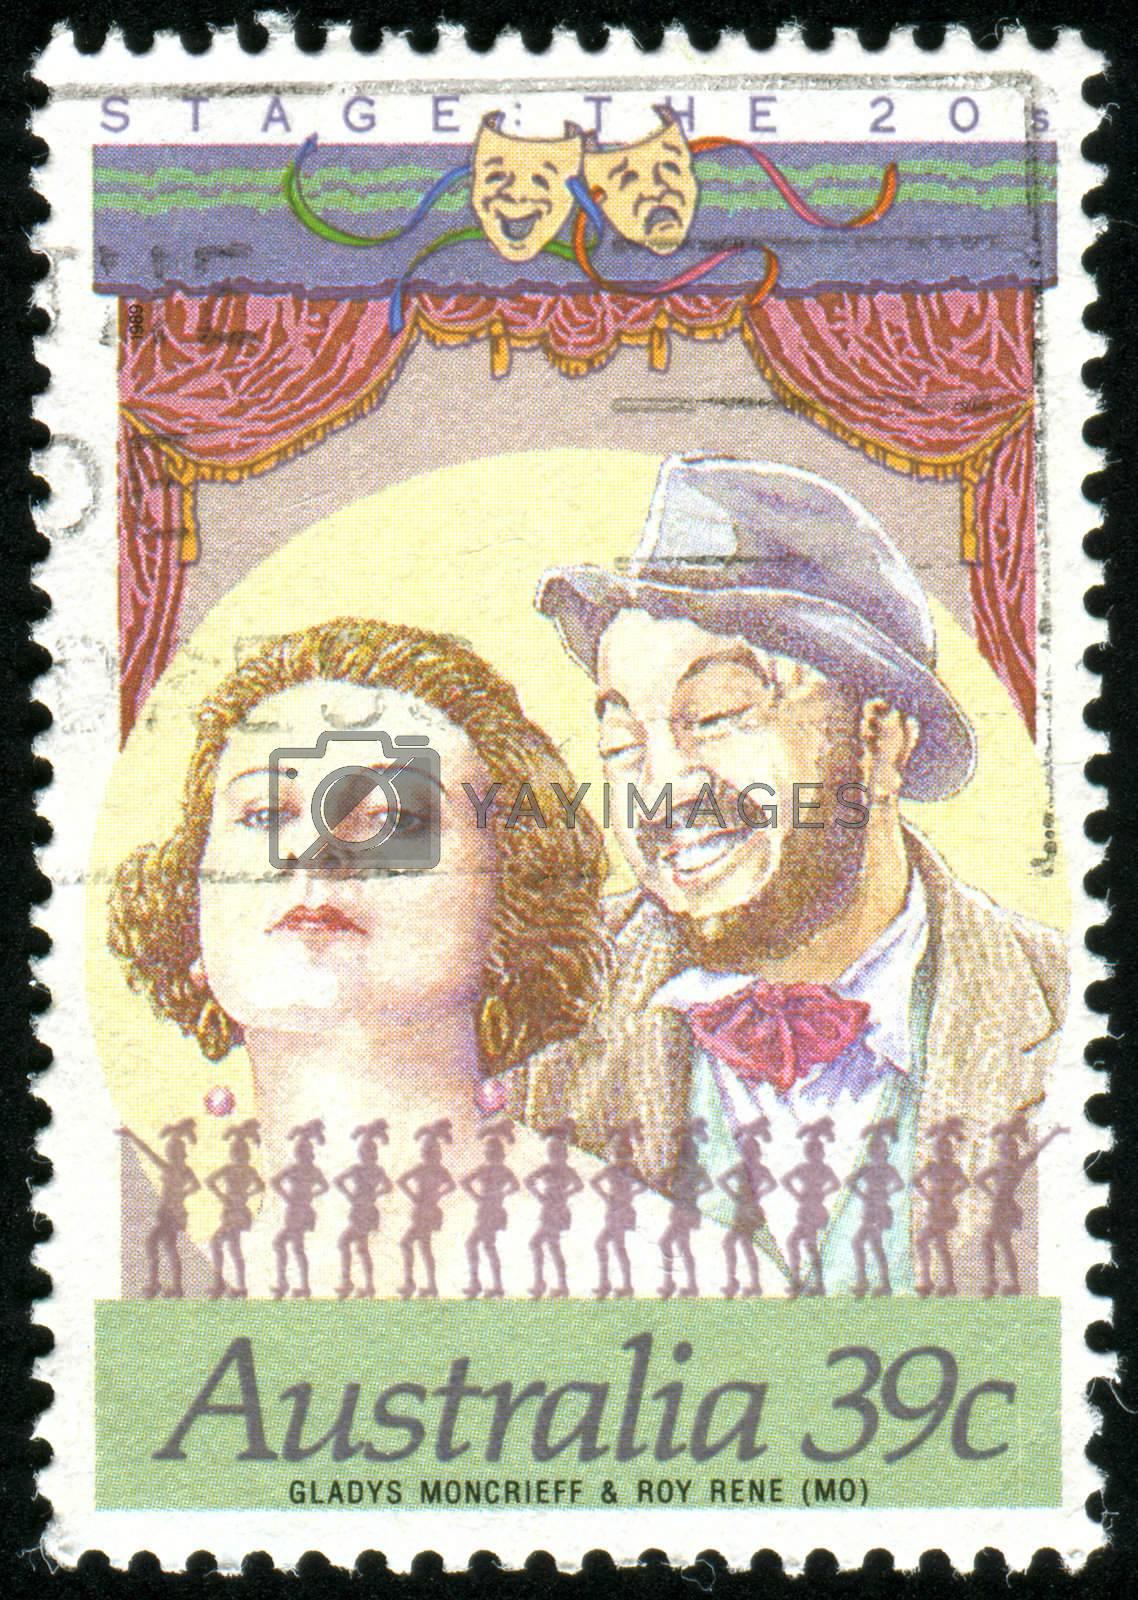 AUSTRALIA - CIRCA 1989: stamp printed by Australia, shows Gladys Mon crieff and Roy Rene, circa 1989